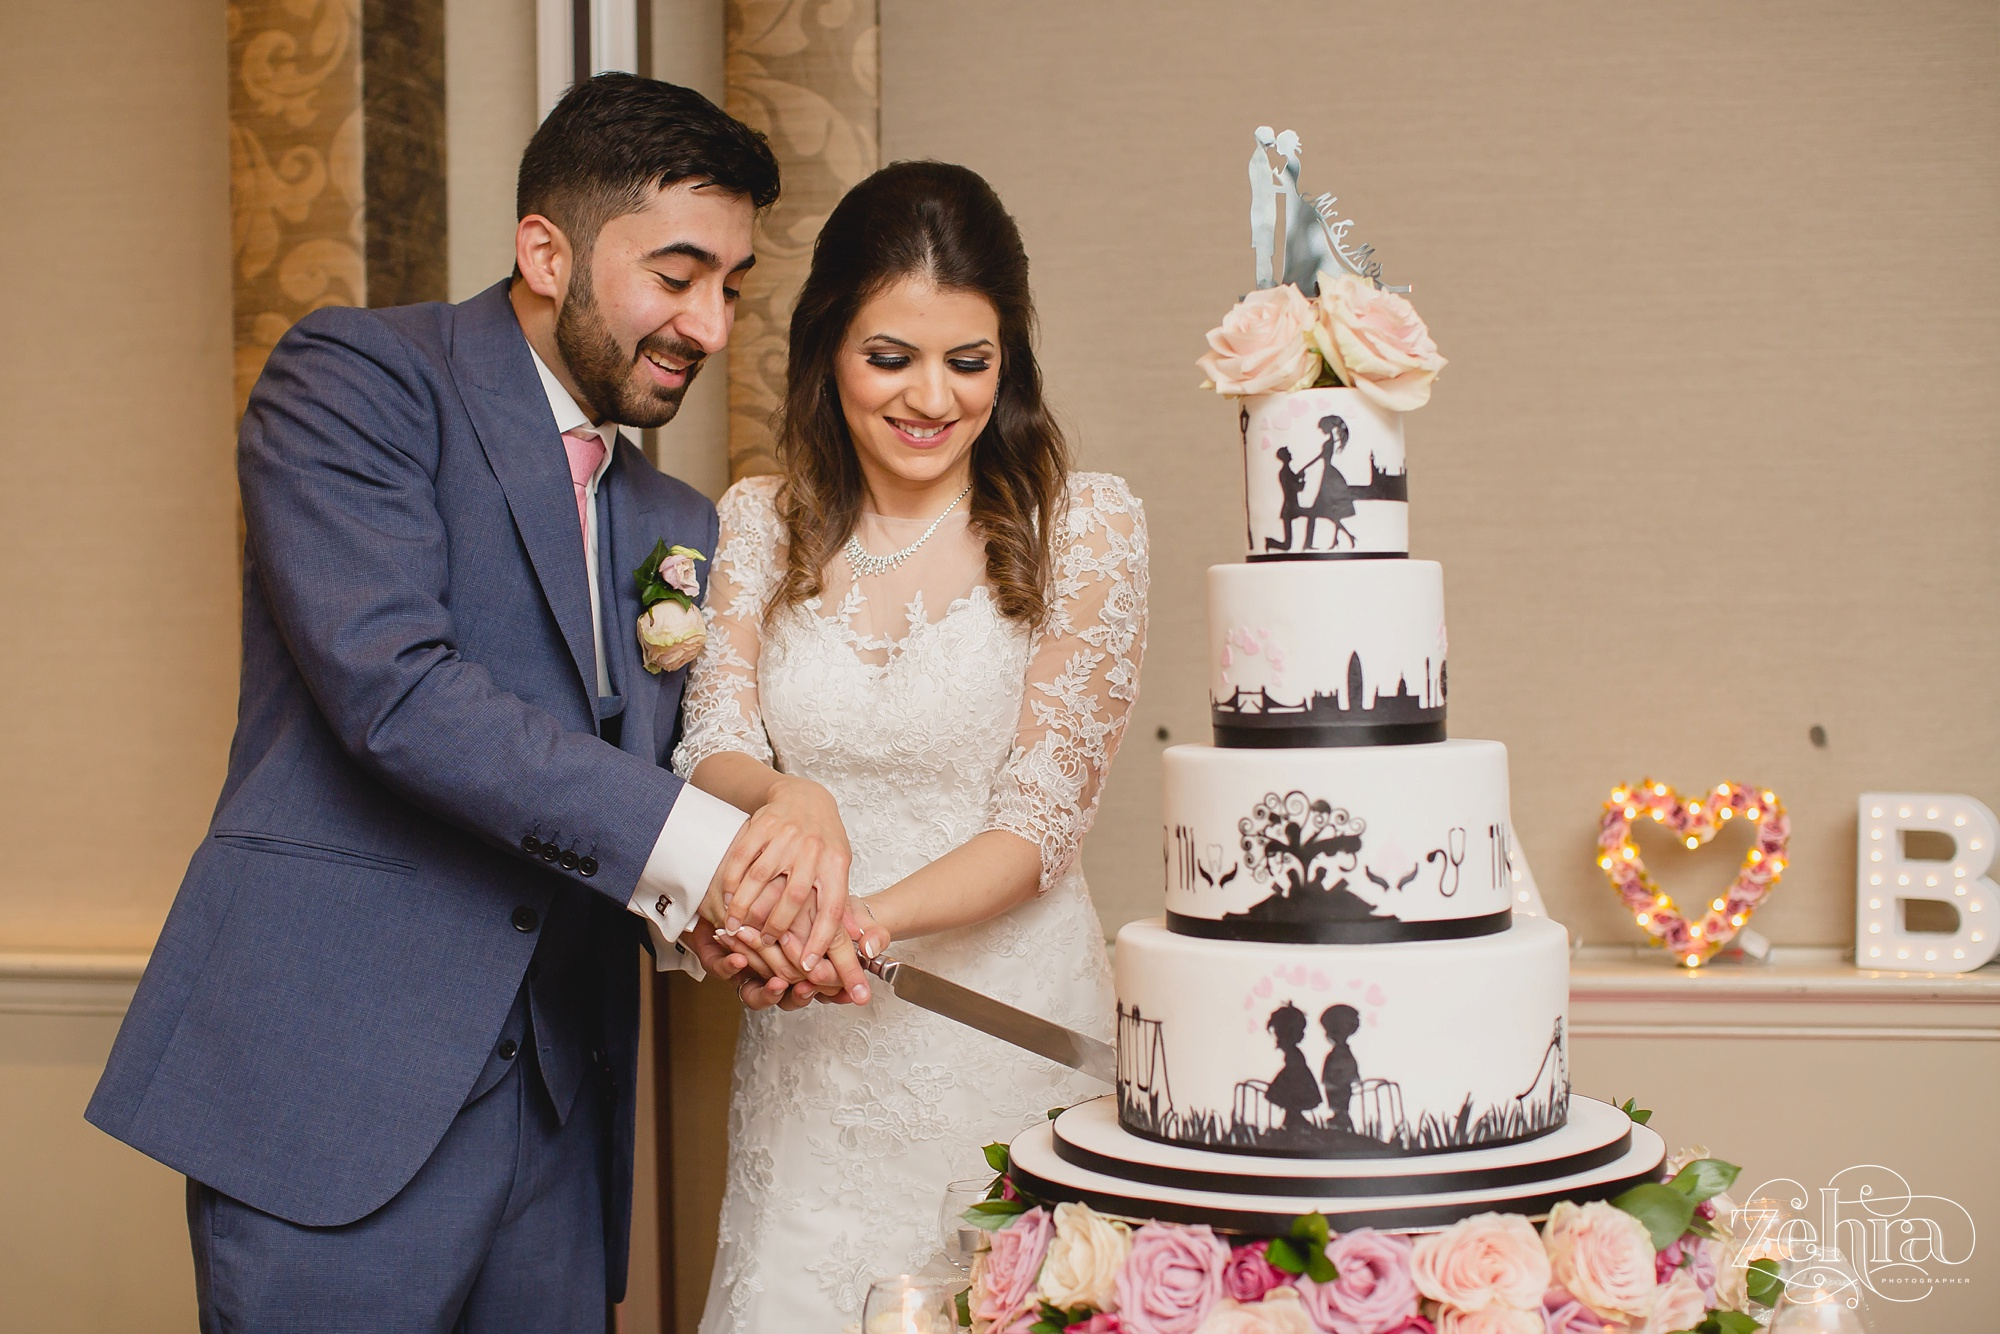 zehra photographer mere cheshire wedding_0043.jpg